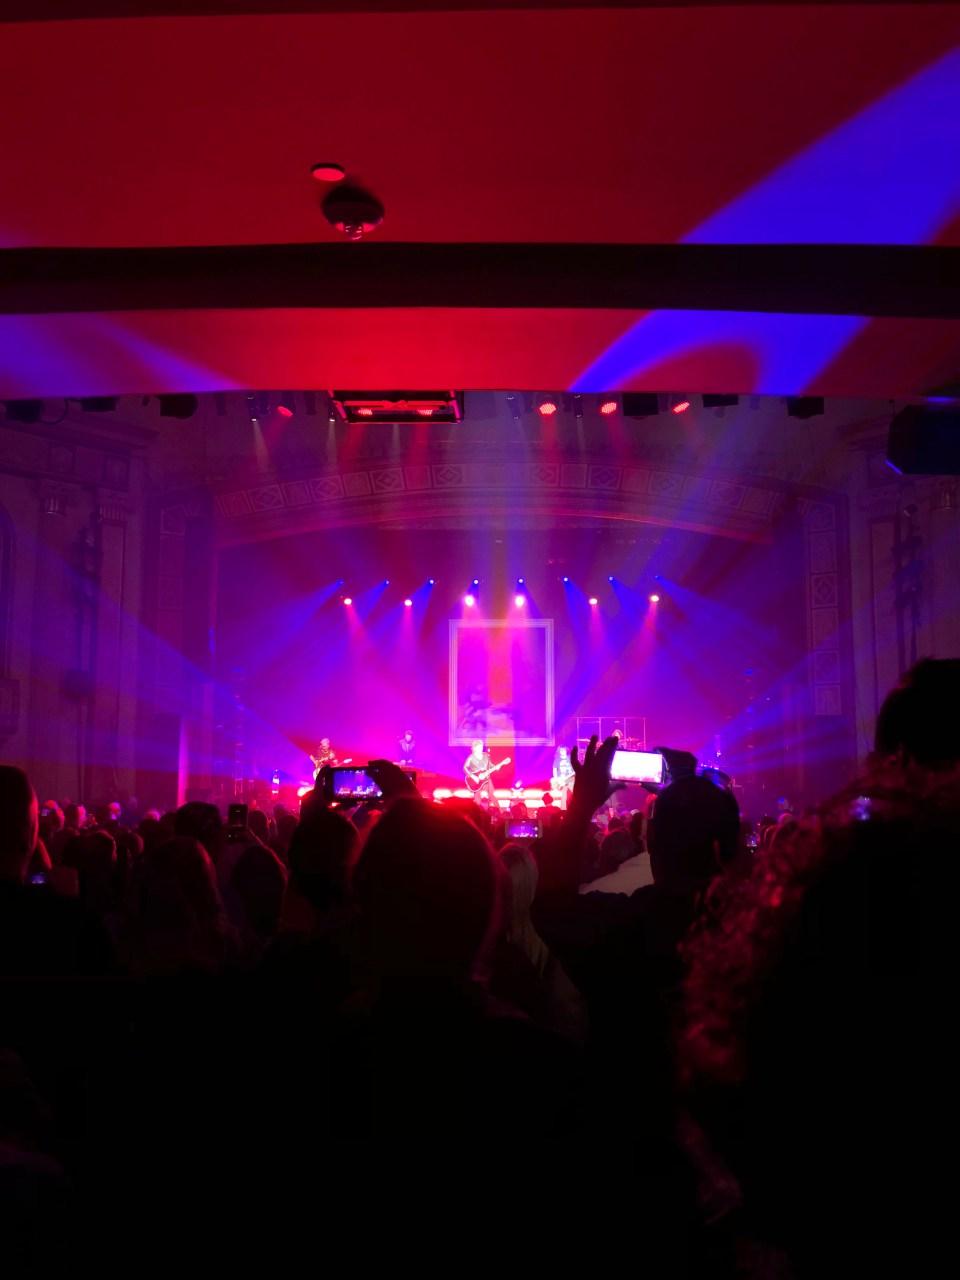 Goo Goo Dolls - Dizzy Up the Girl Anniversary 4